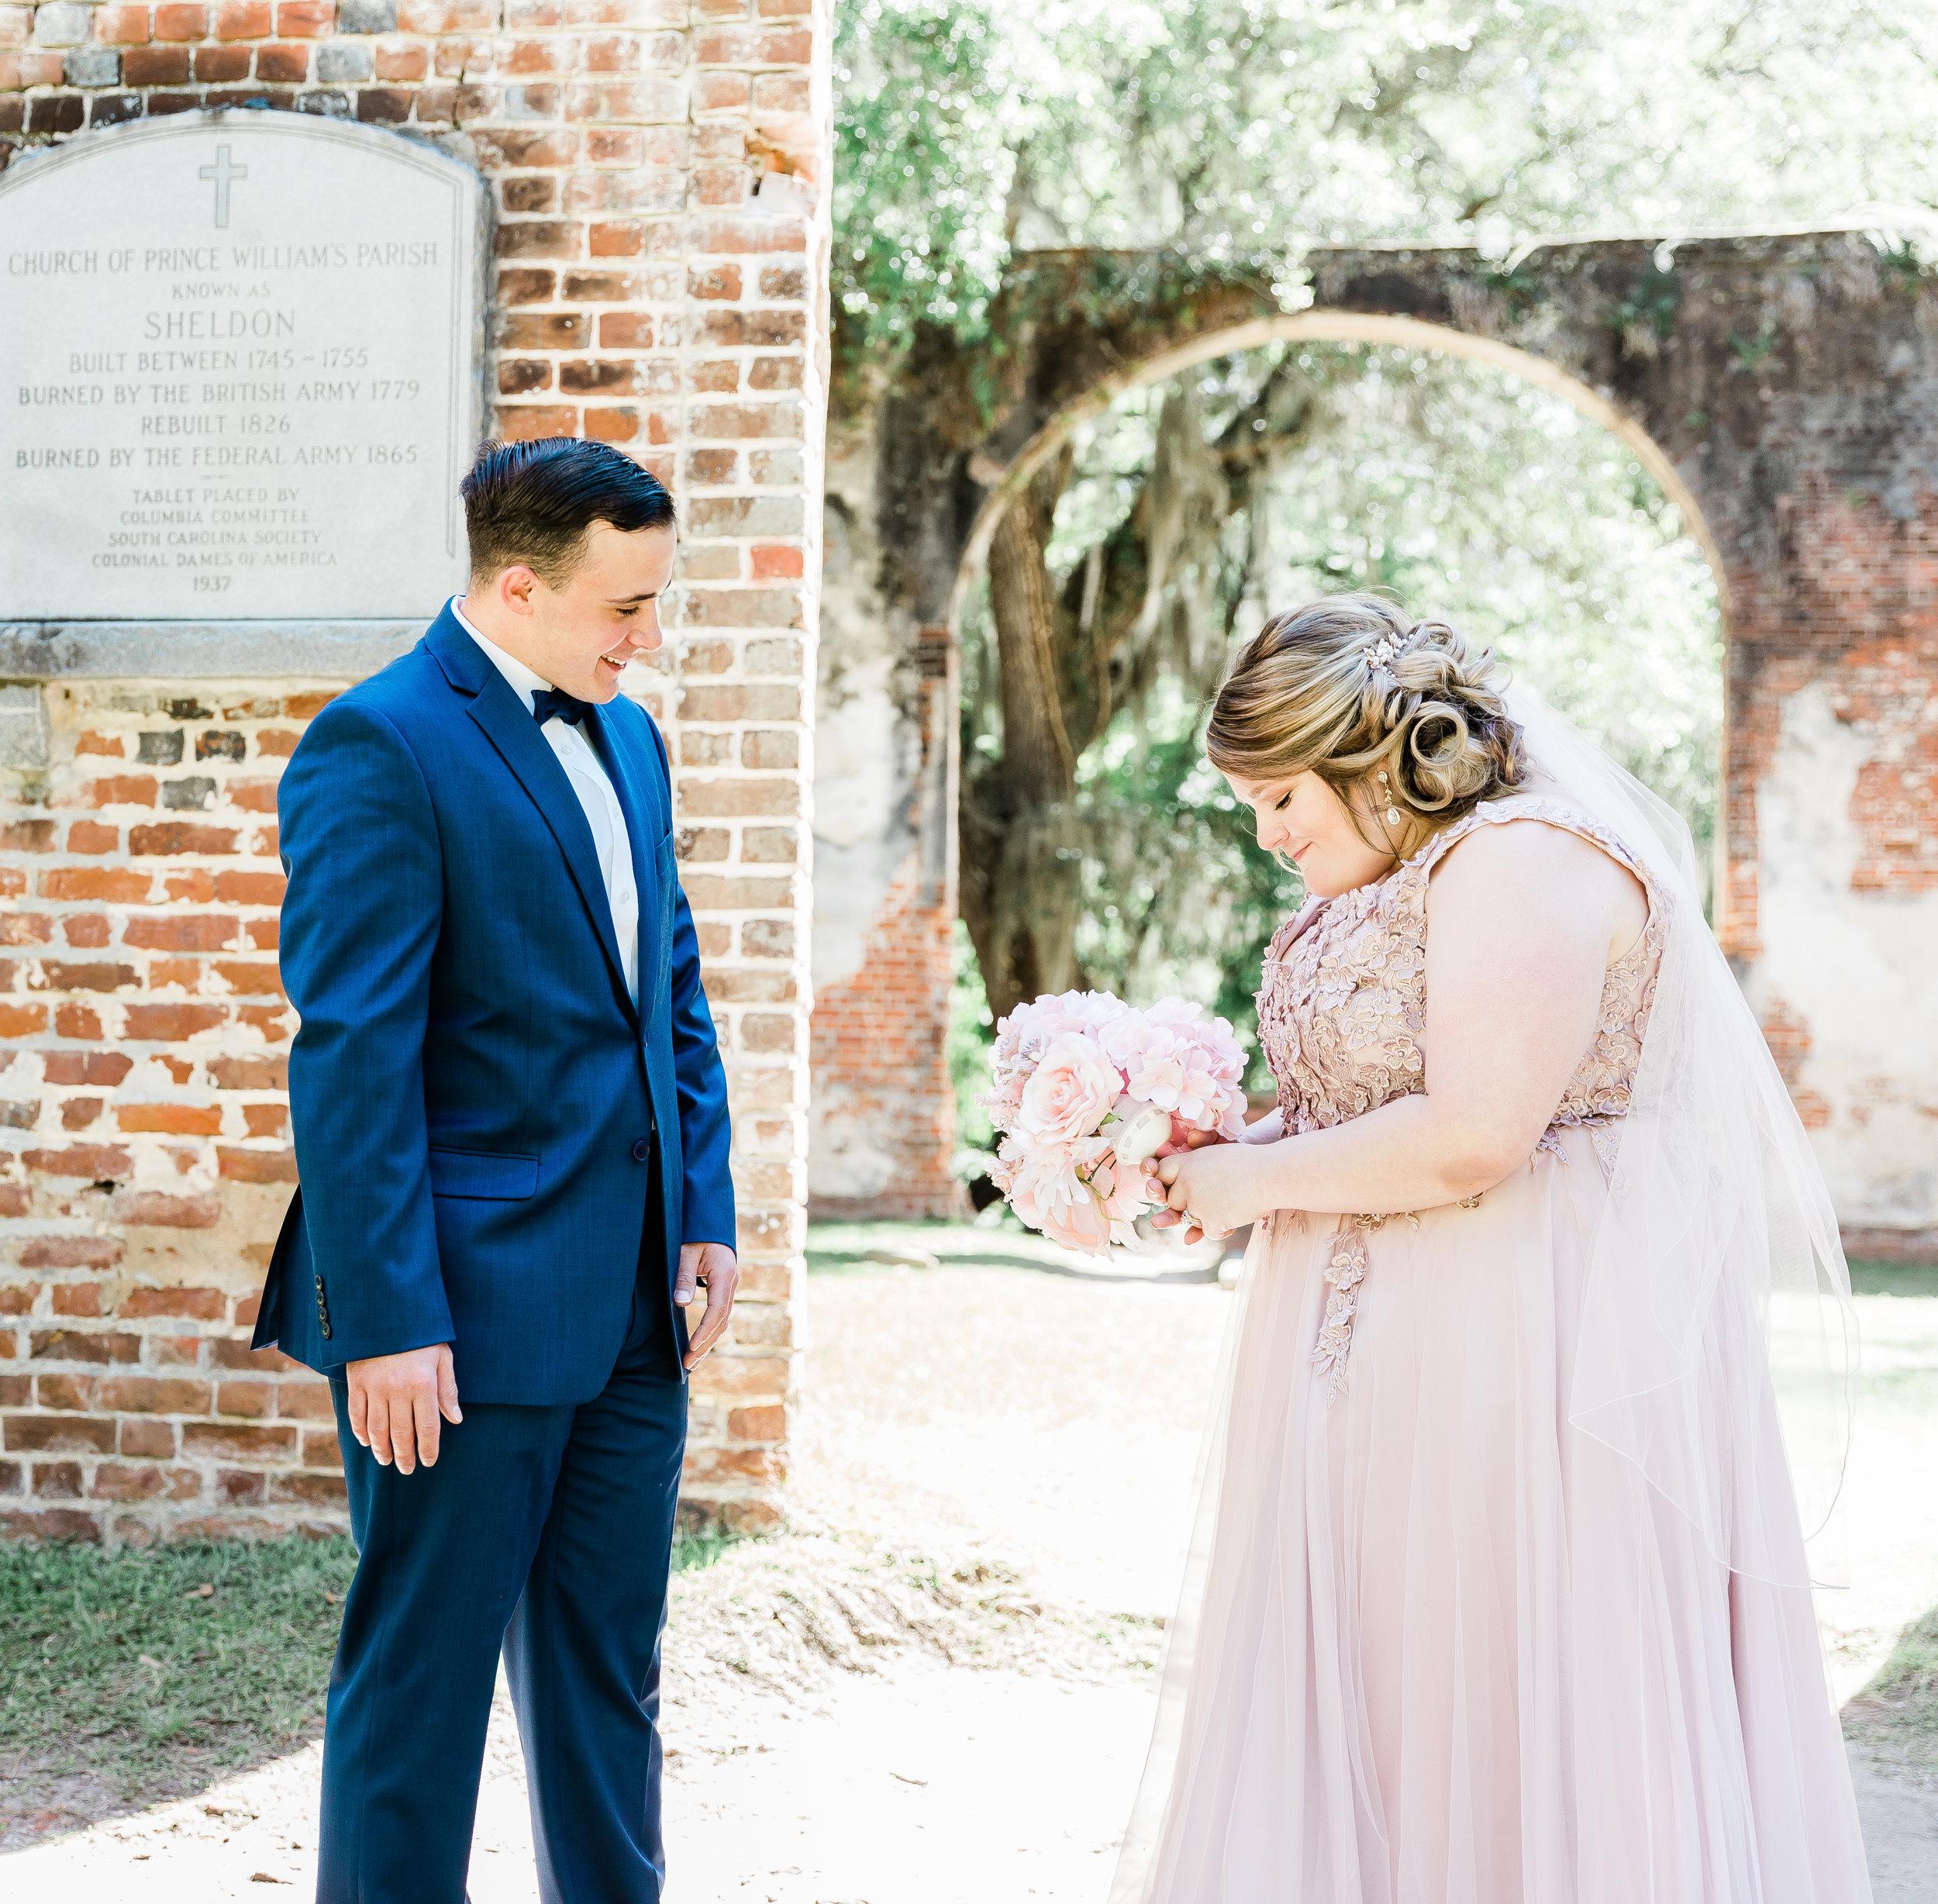 20190417-Southern Lens Photography-savannah family photographer- Ashley and Zack-old sheldon church ruins-201923.jpg